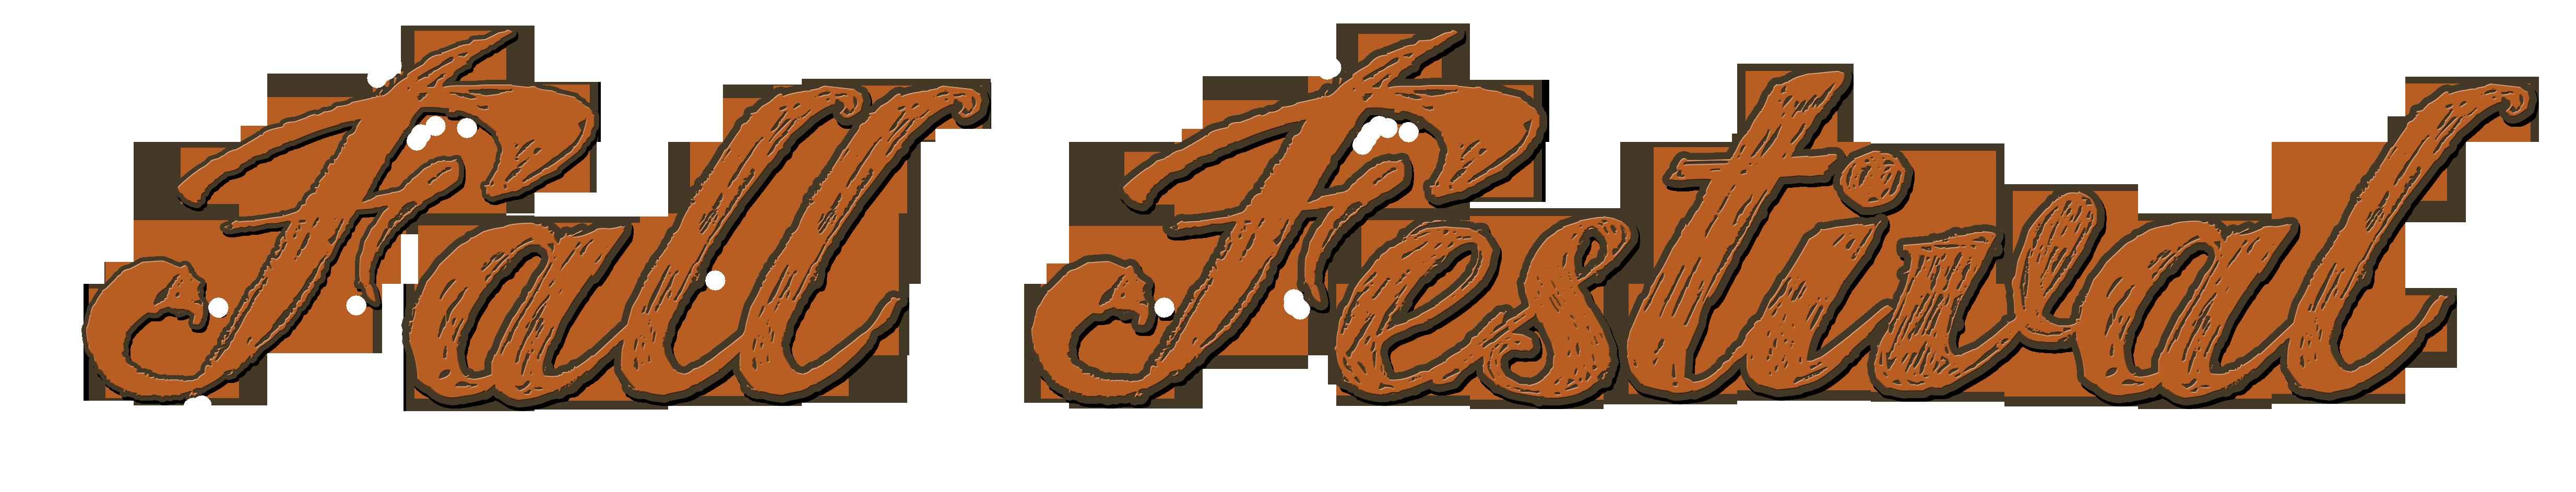 Top fall clear image. Festival clipart parish festival